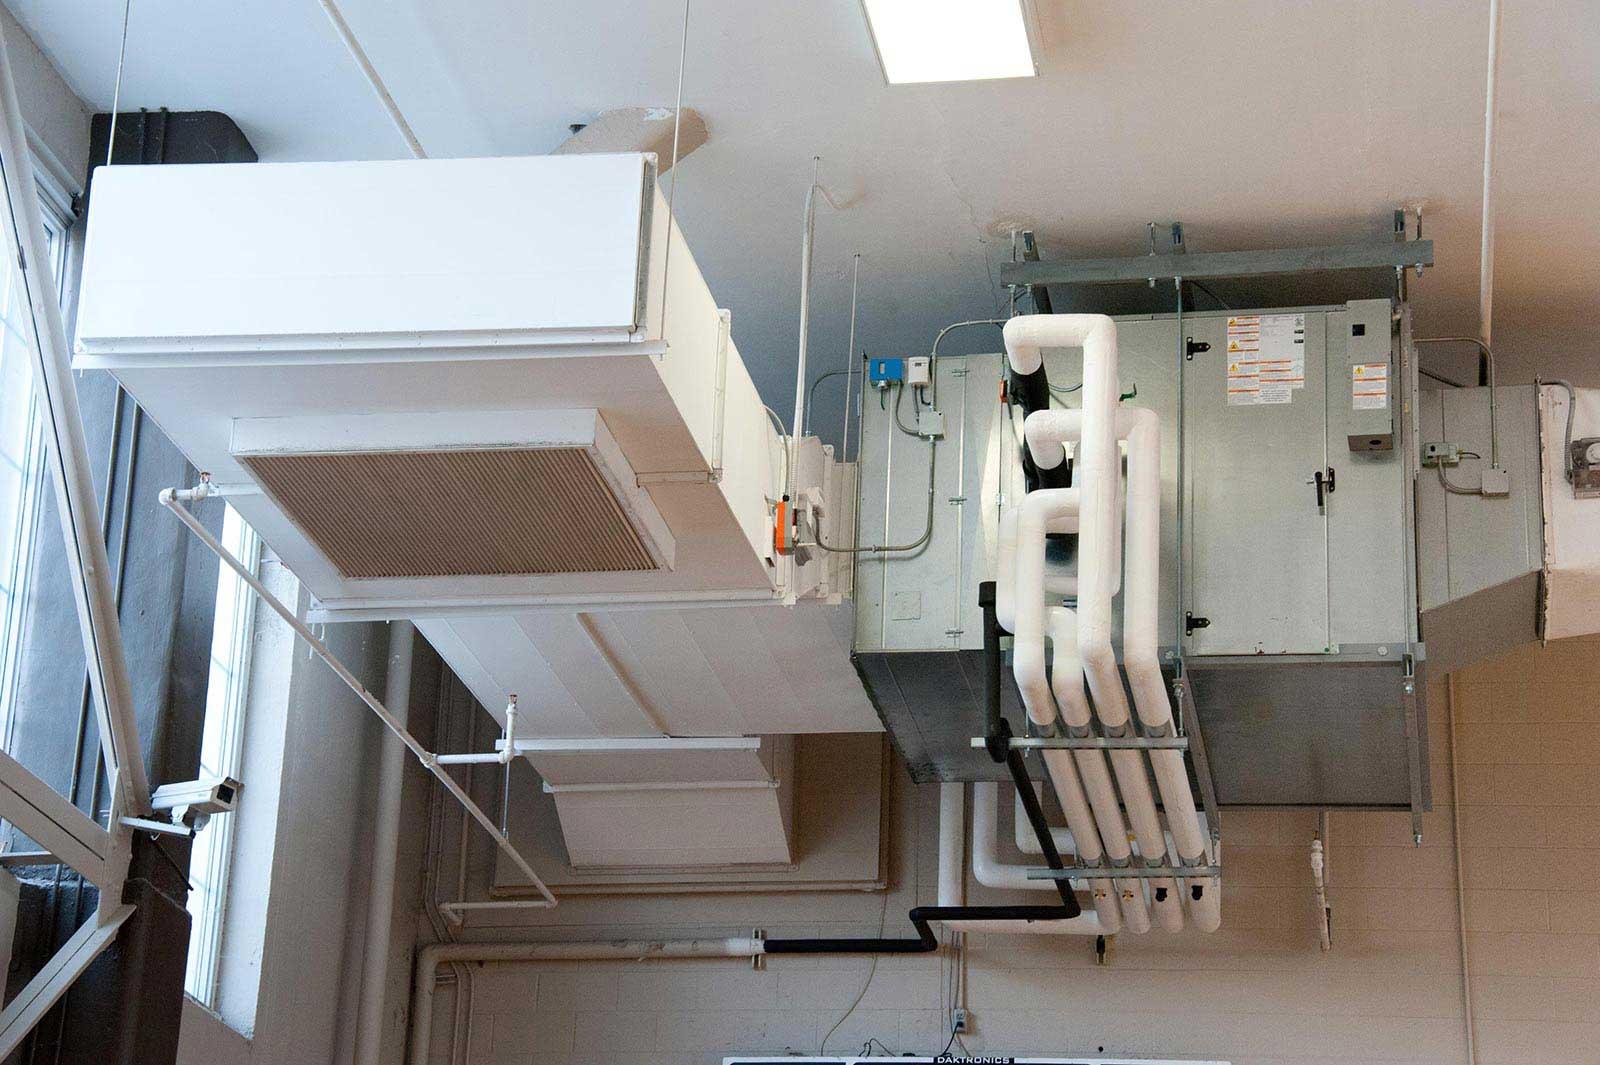 hvac systems installations maintenance attic crew